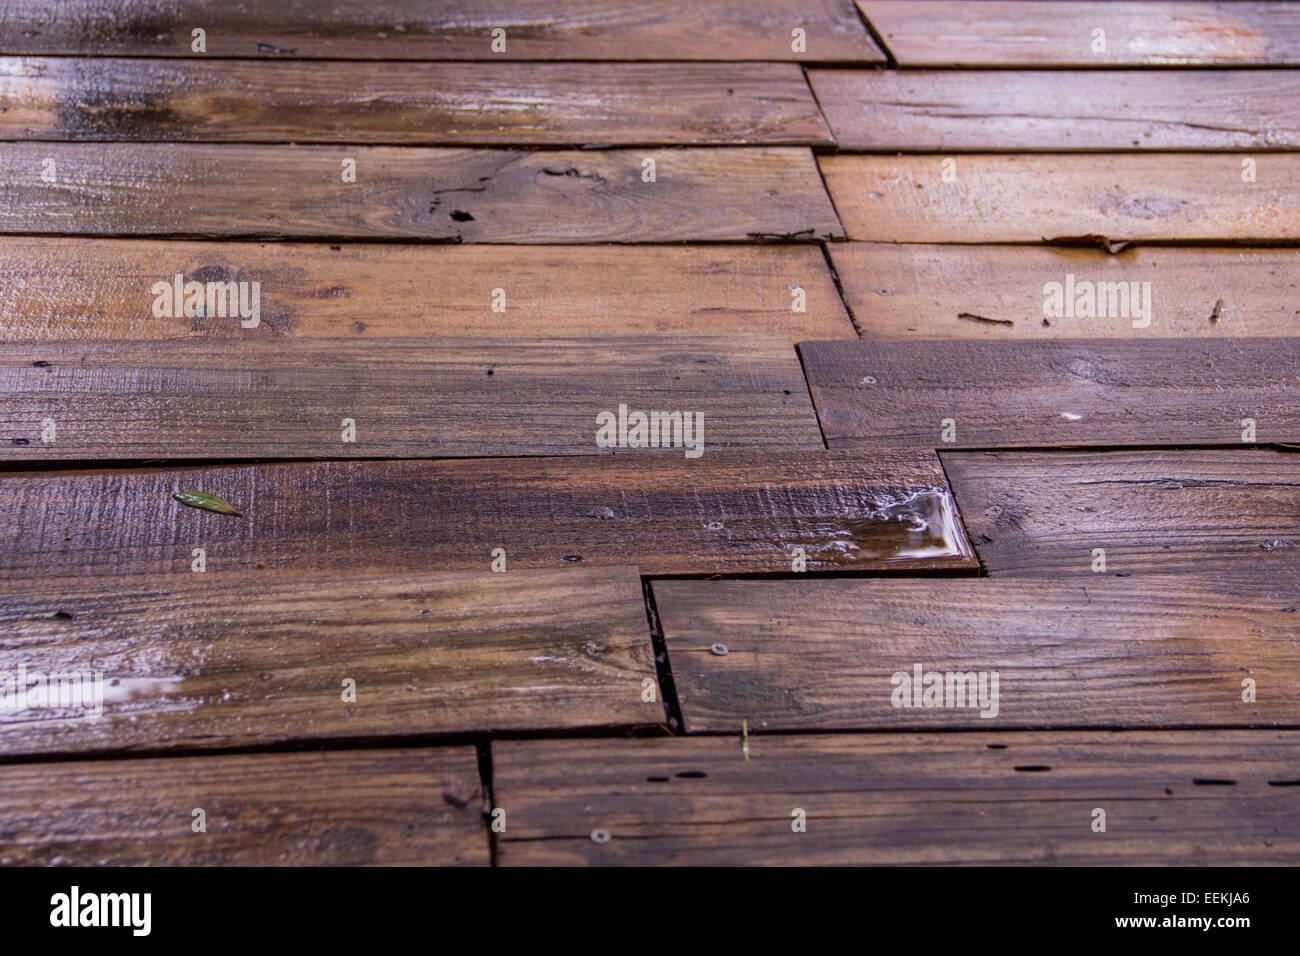 wet, warped wood. - Stock Image